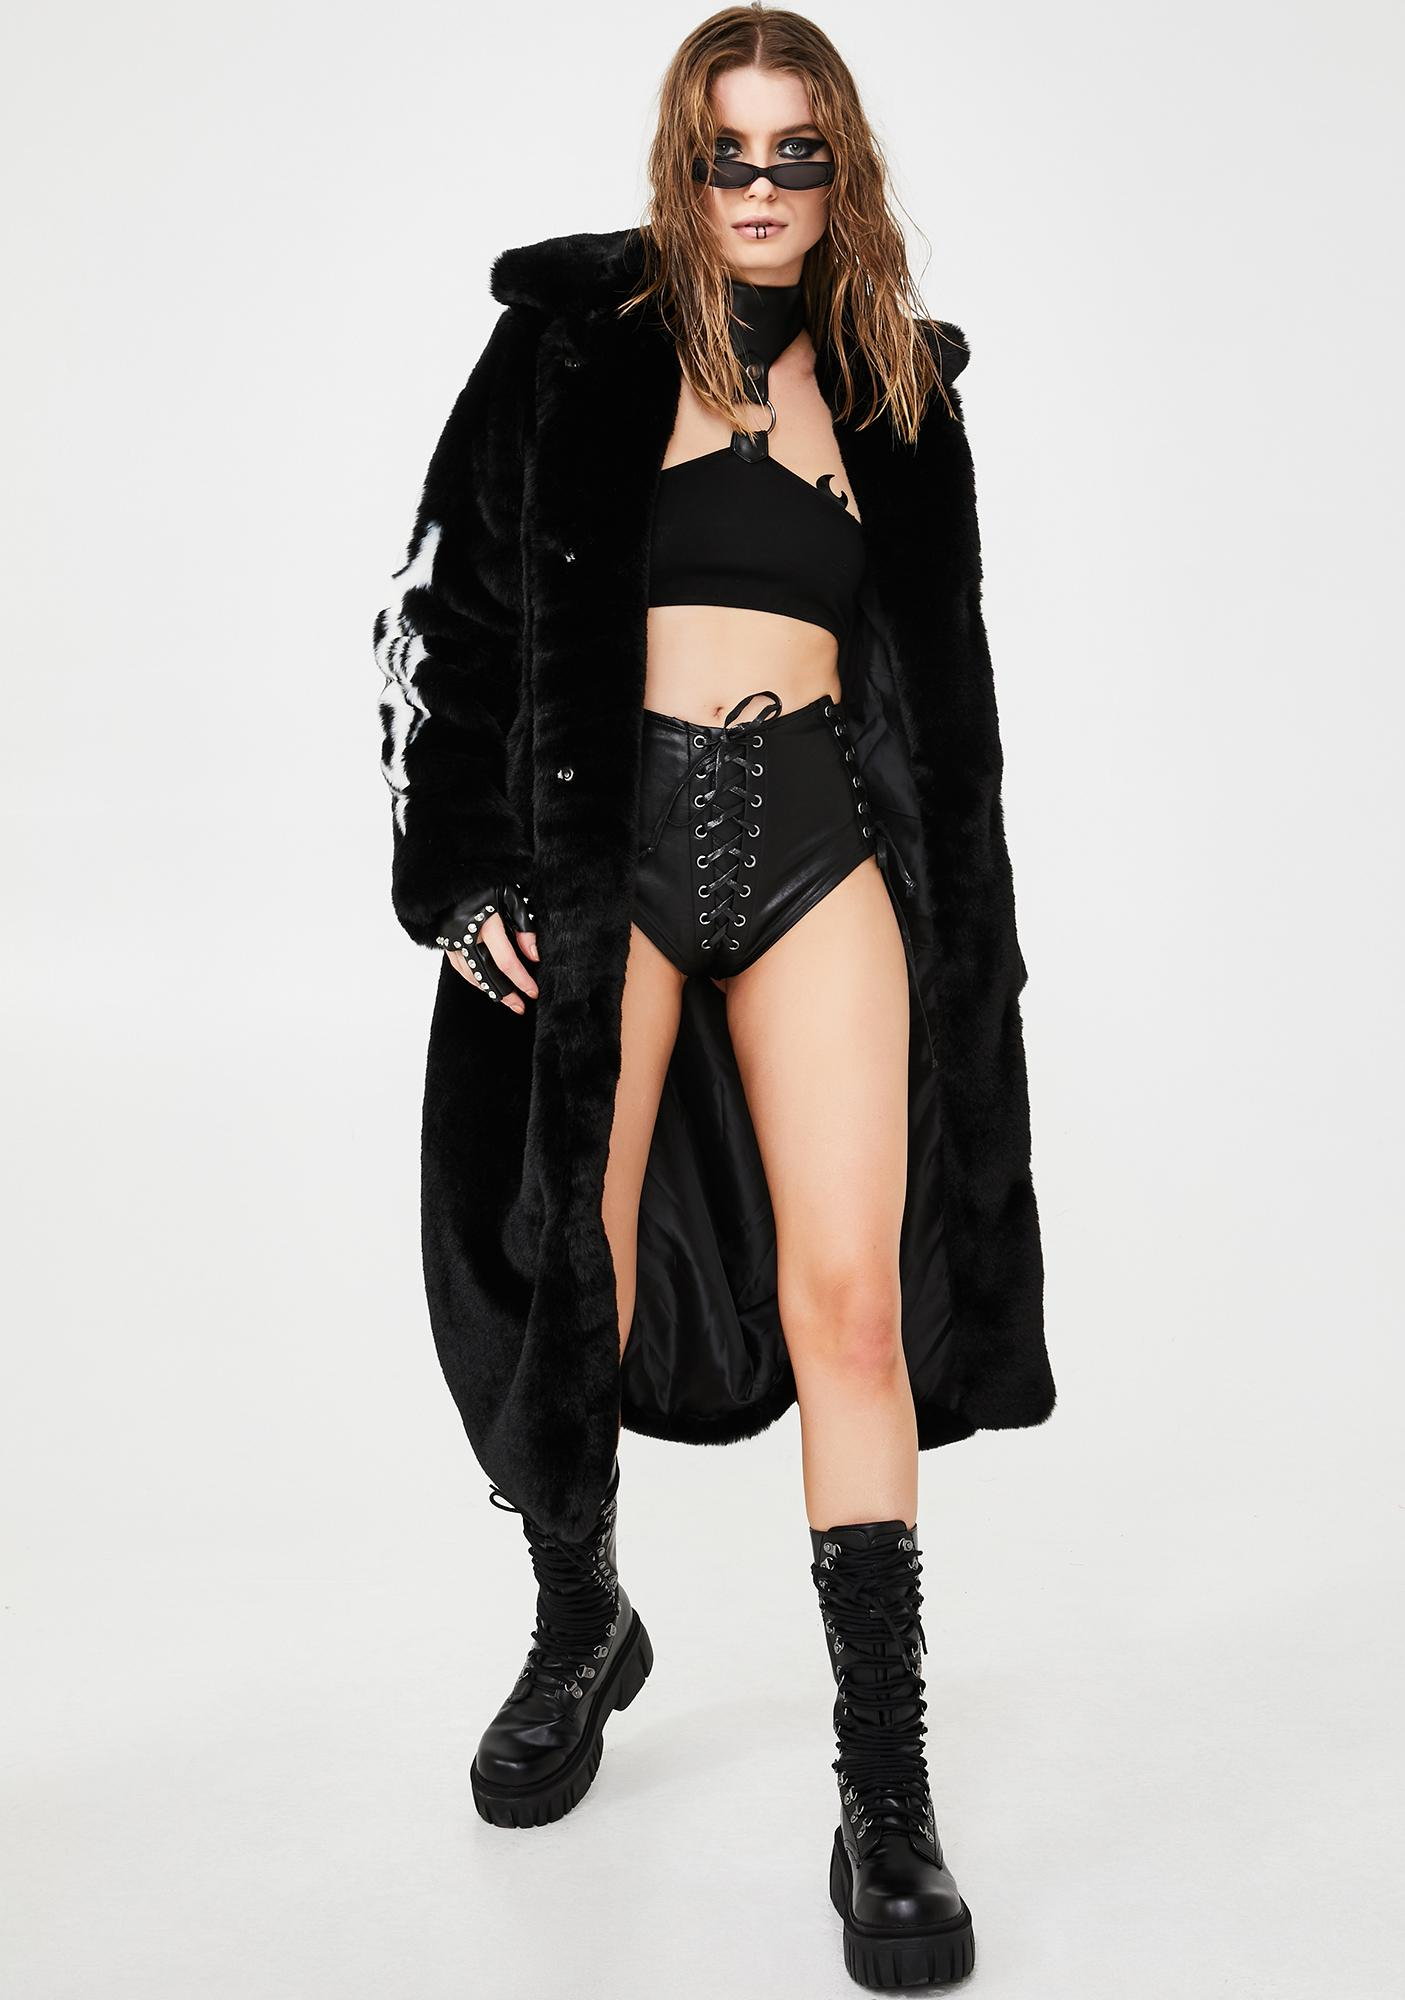 Club Exx Lady Minxx Lace-Up Shorts